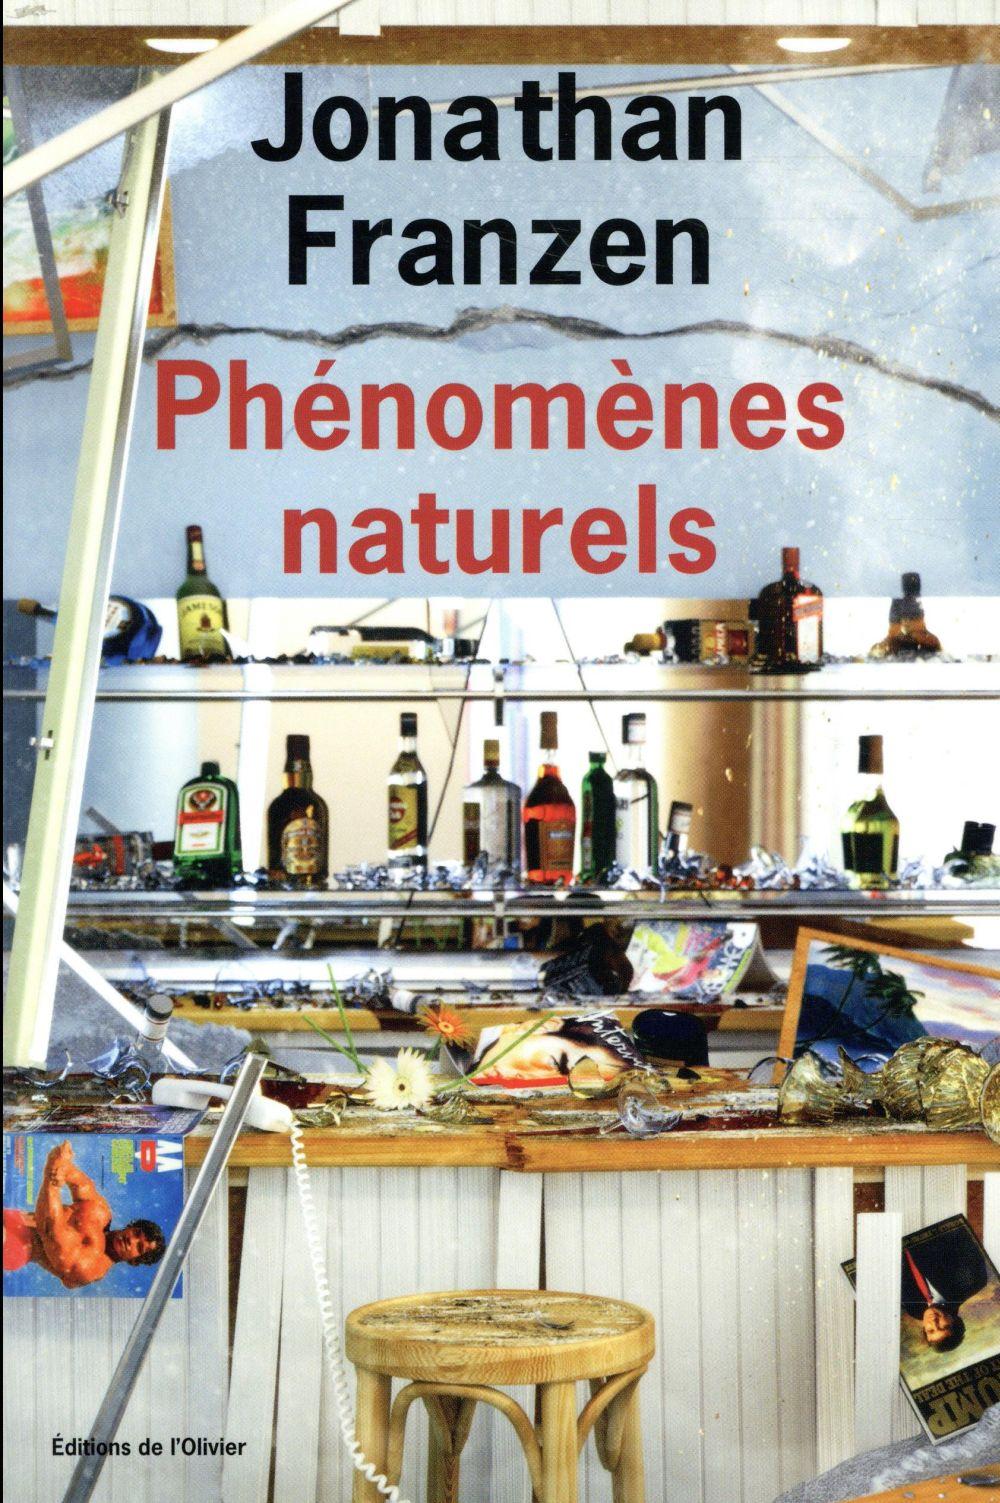 Phénomènes naturels